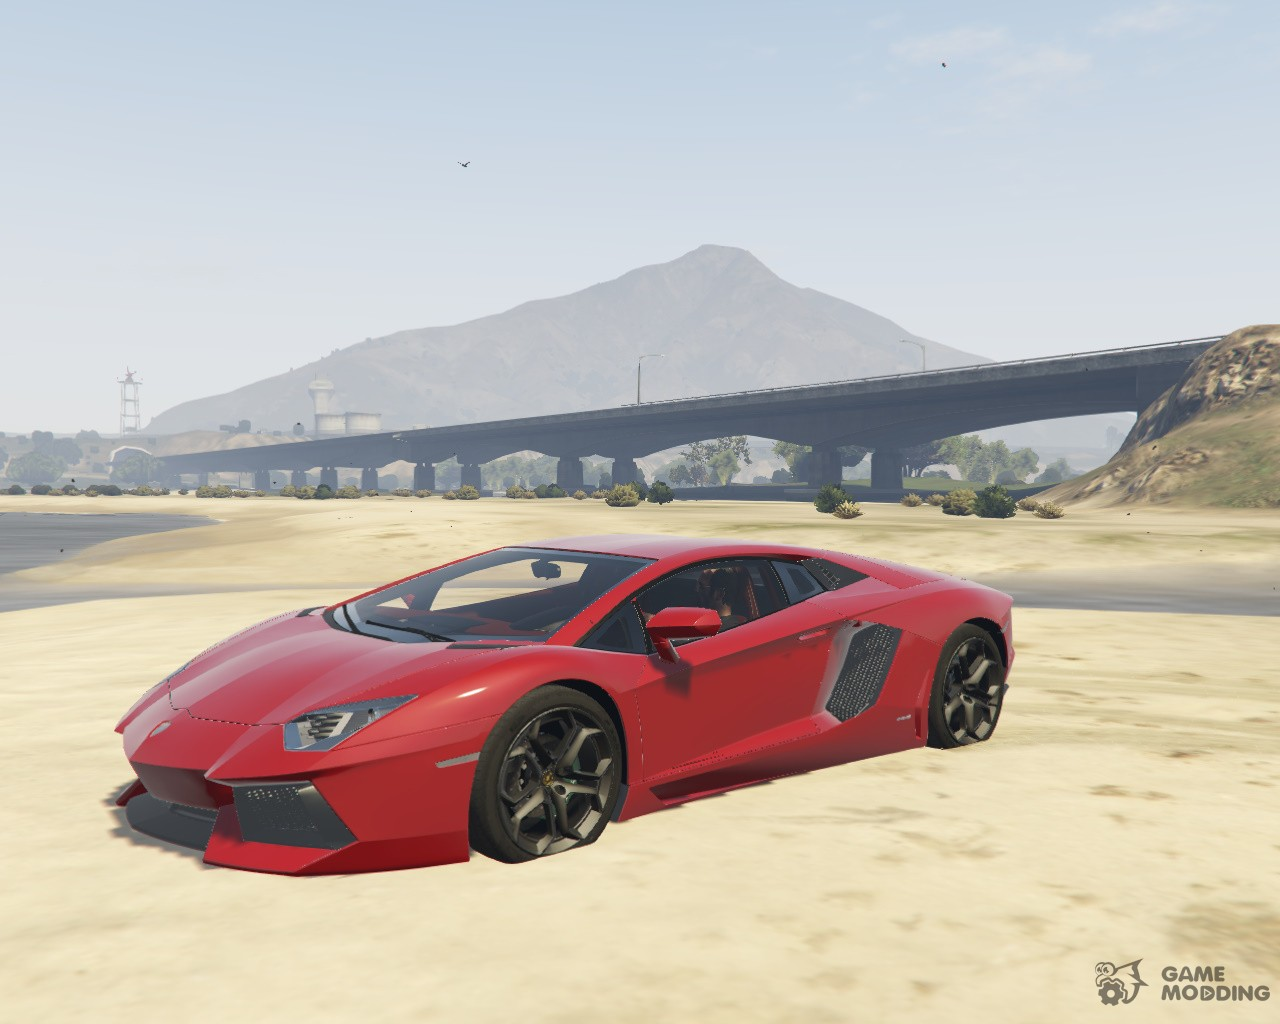 Lamborghini Aventador P700 4 V 0.2 For GTA 5